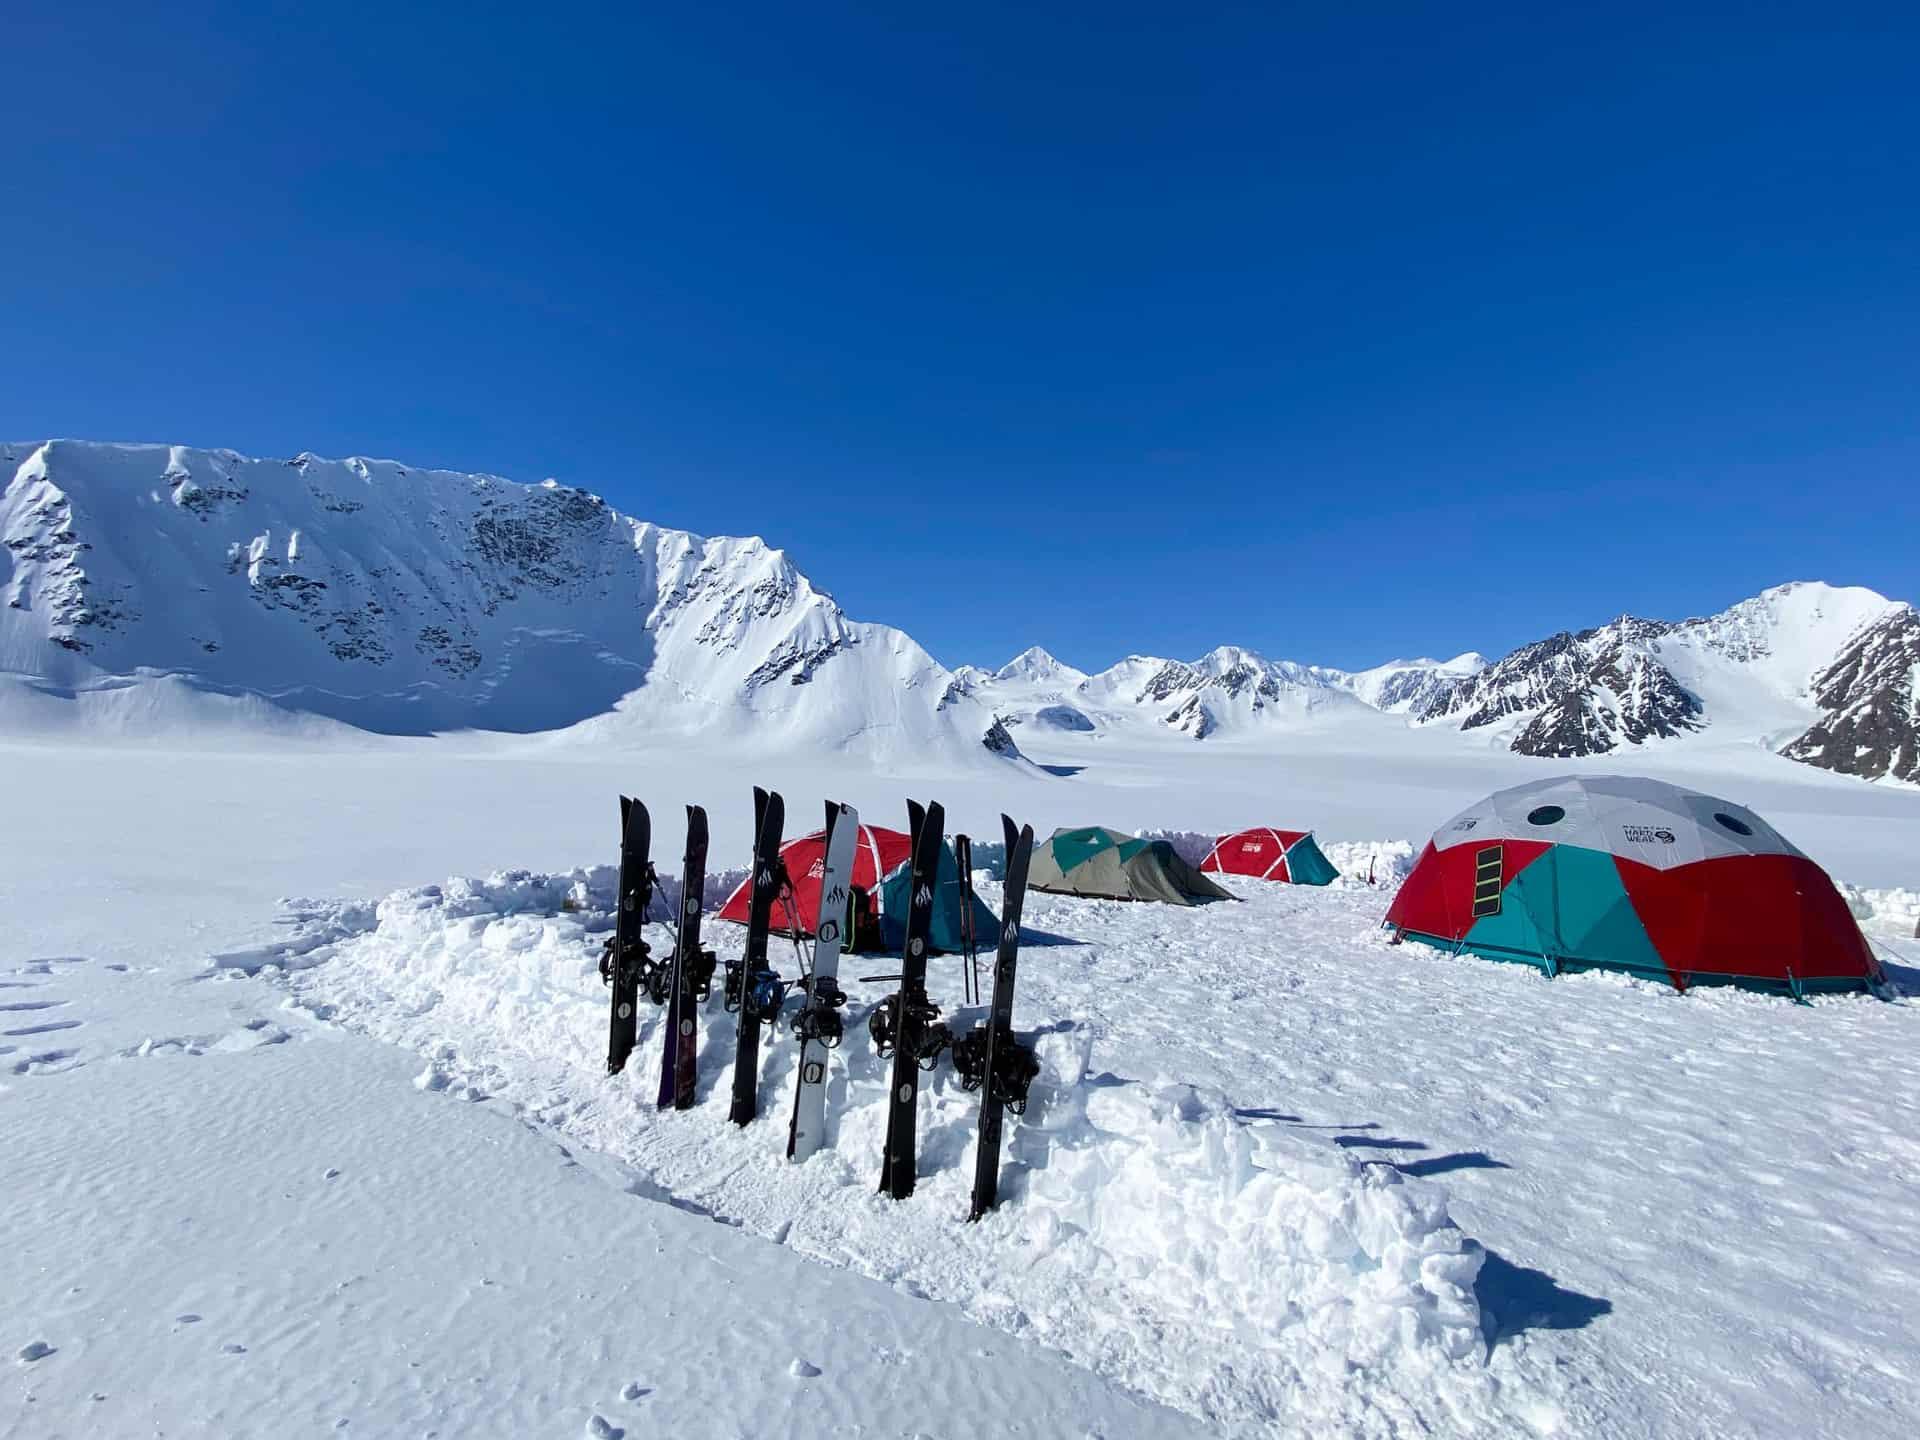 Glacier basecamp for the Pulseline Adventure AK backcountry camp